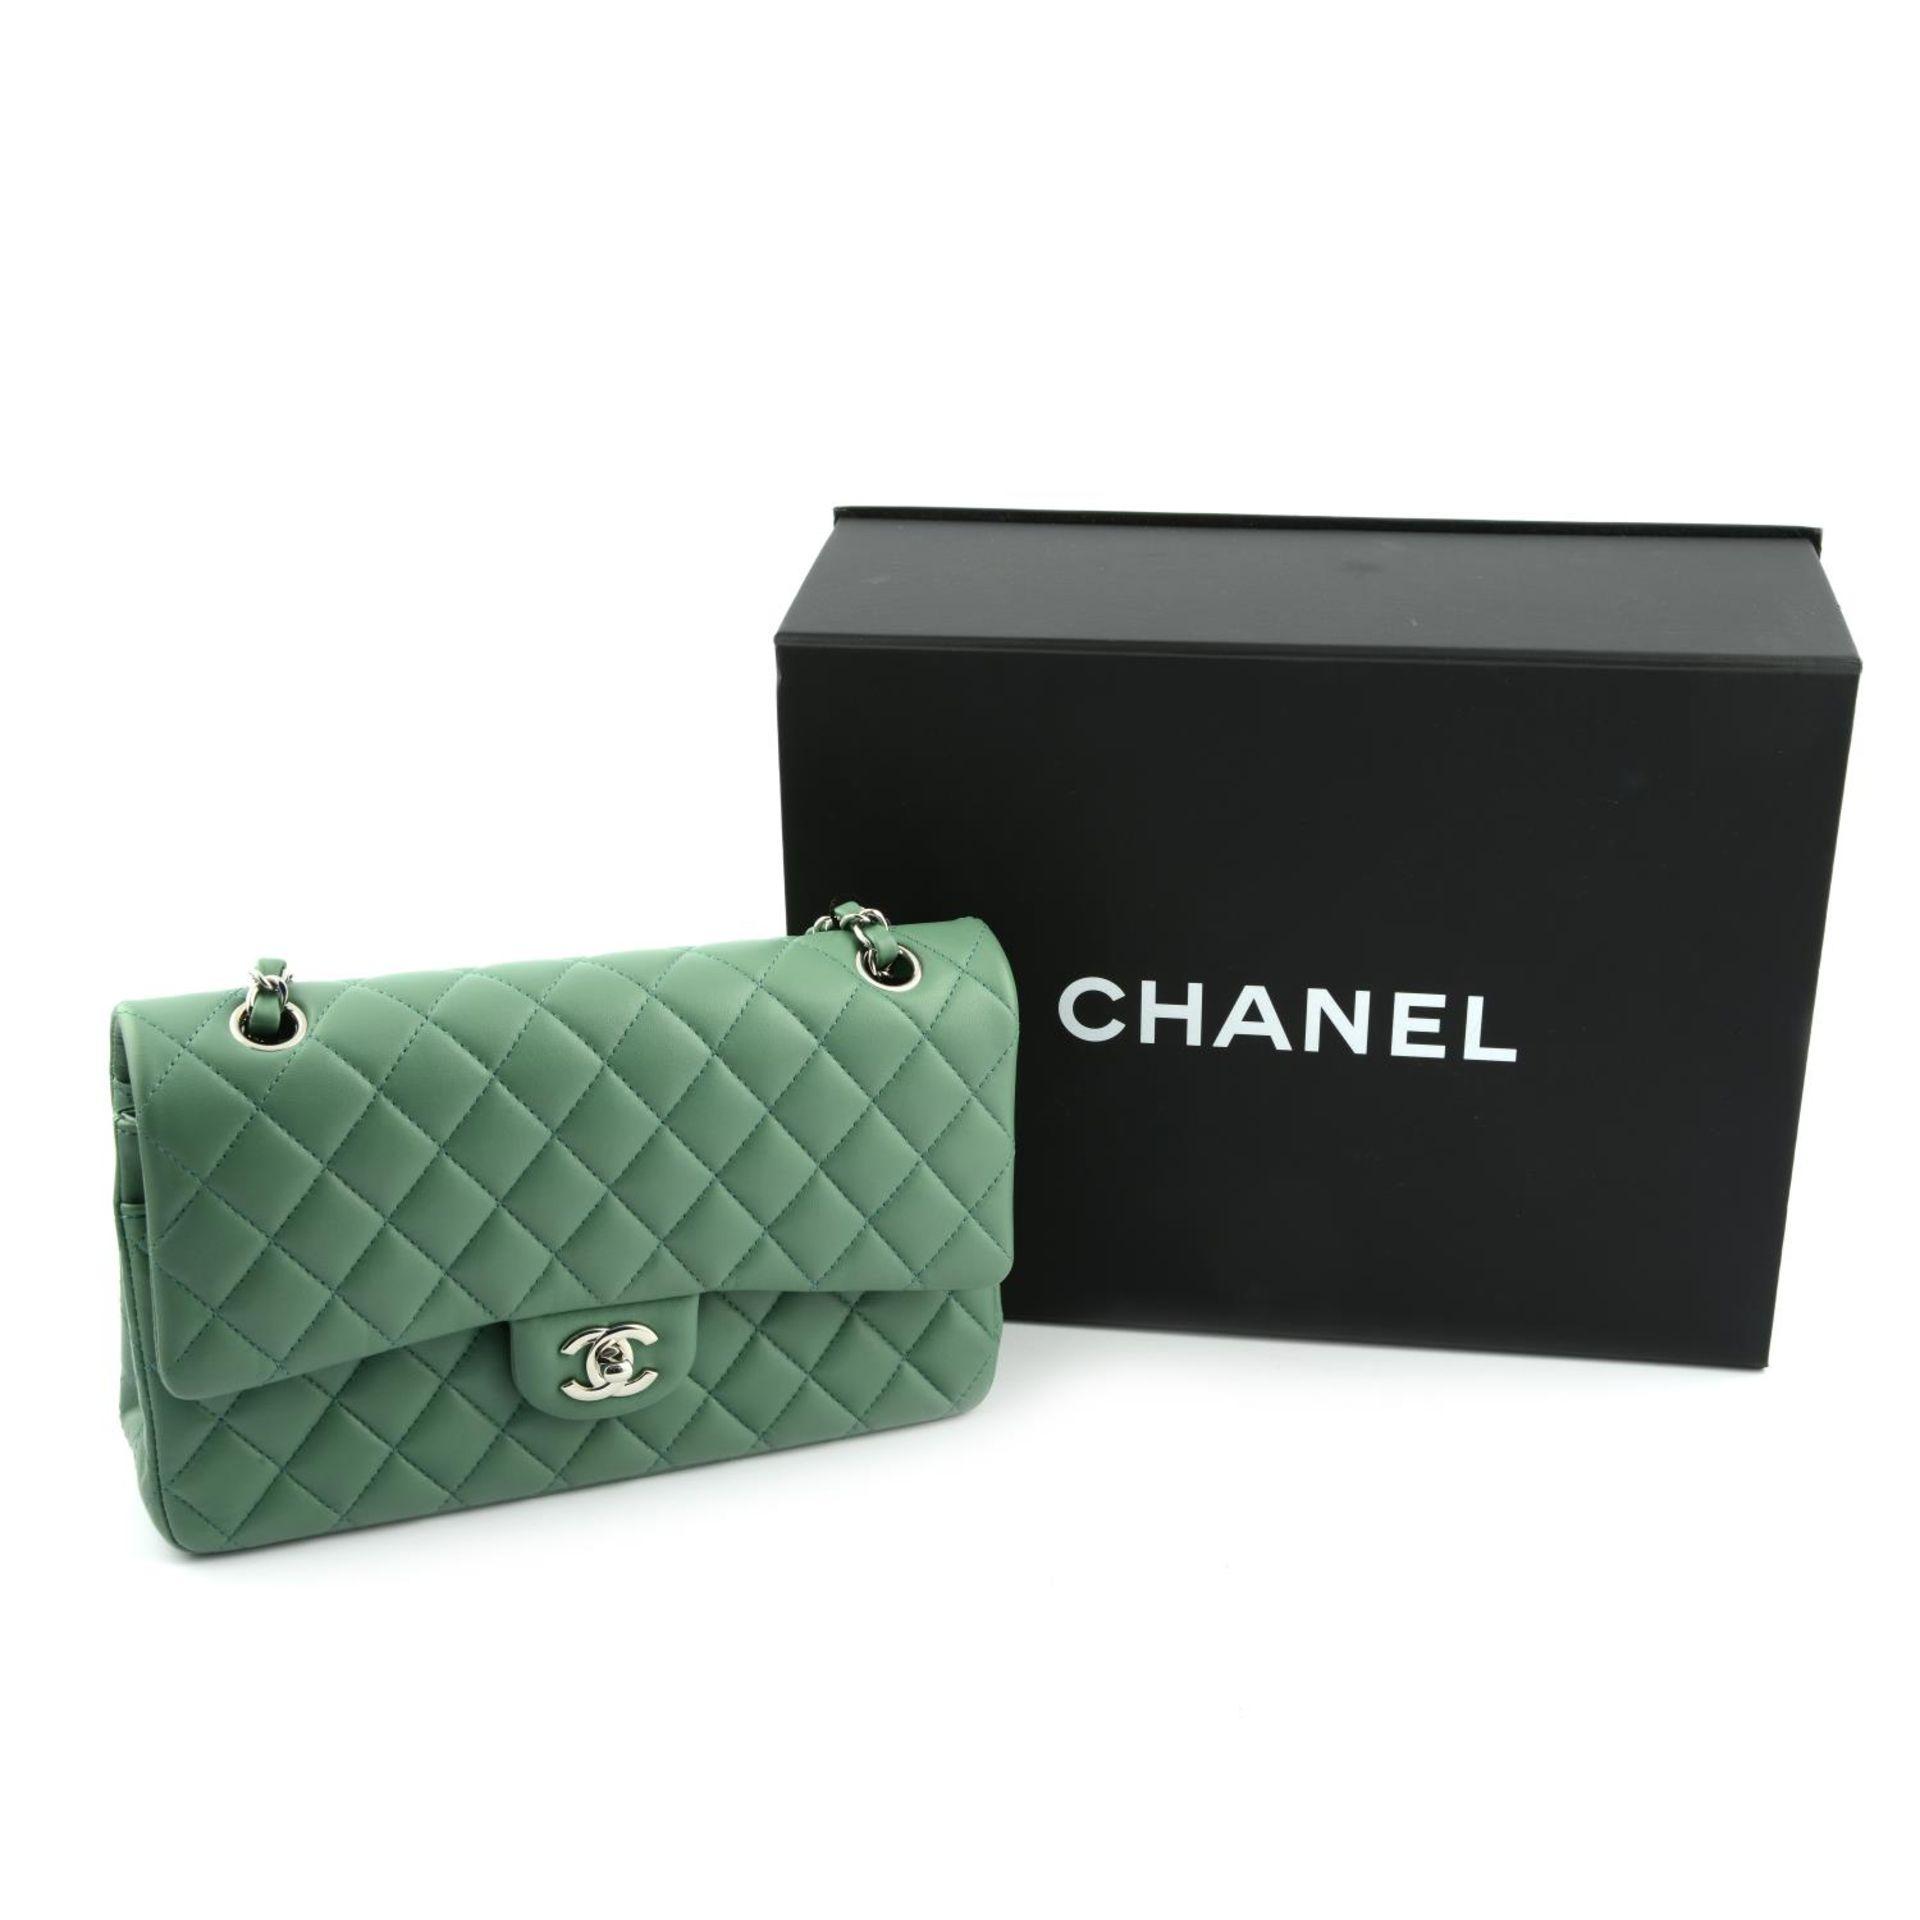 CHANEL - a green medium classic double flap handbag. - Image 7 of 7